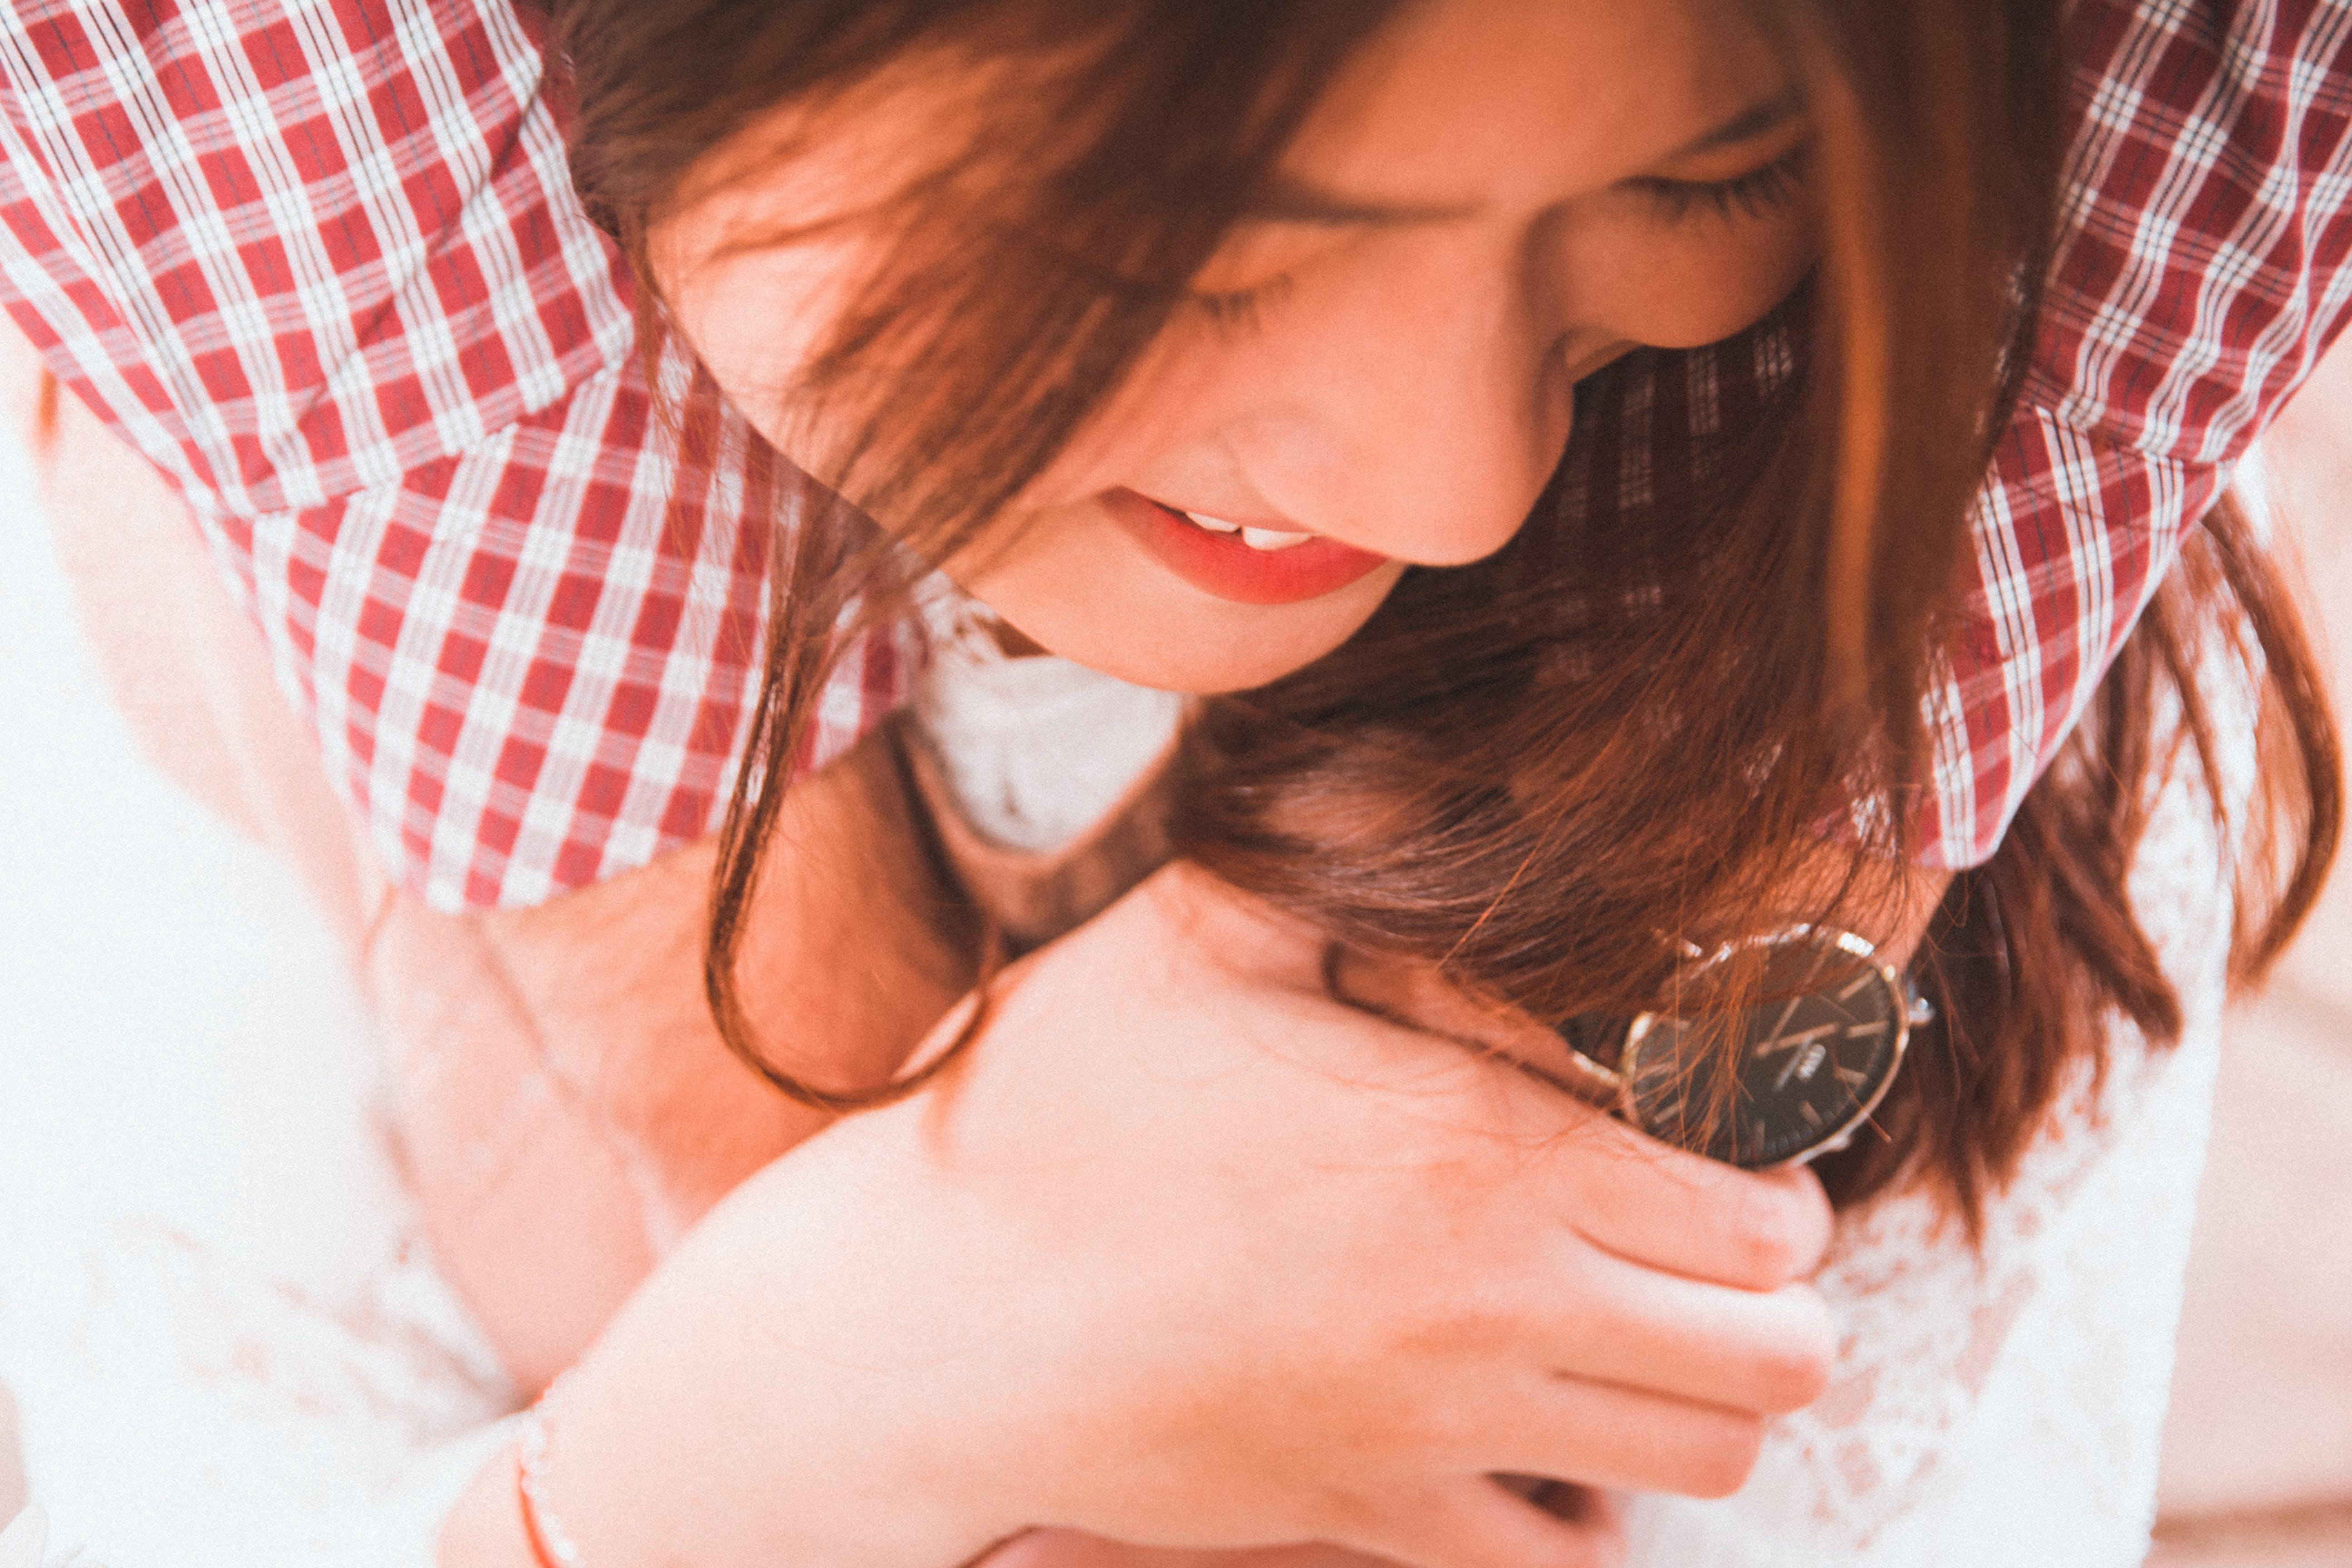 Woman Holding Round Black Analog Watch